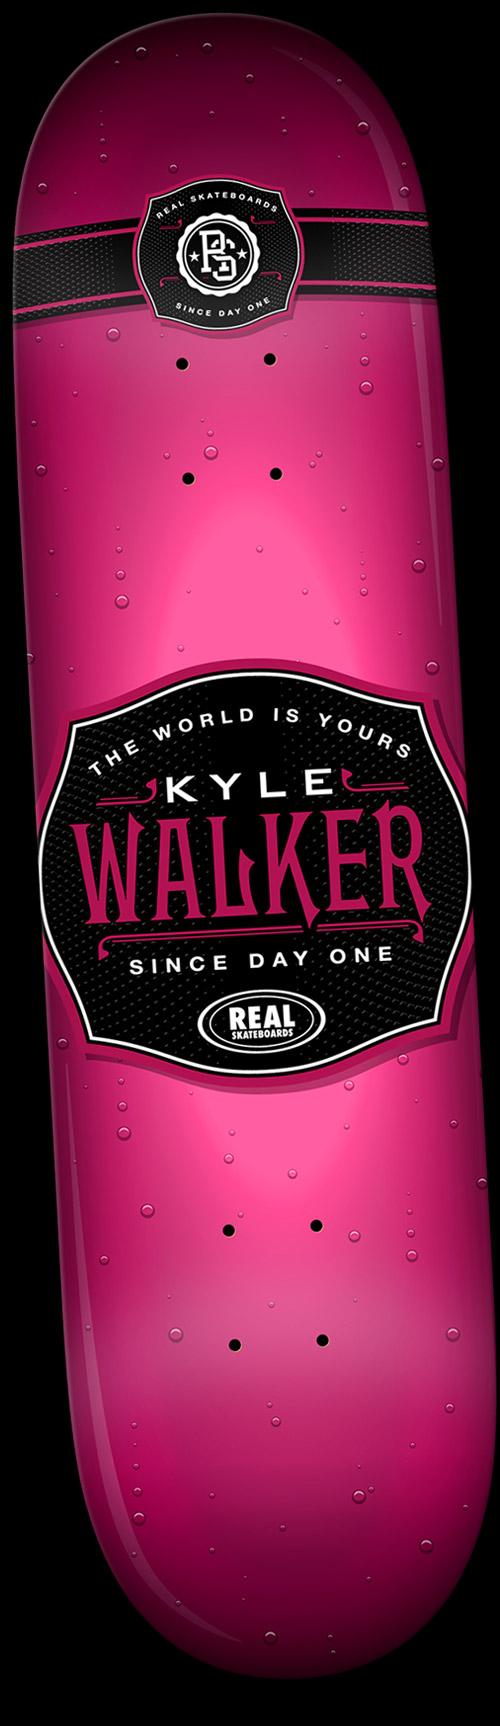 kyle-walker-rare-rose